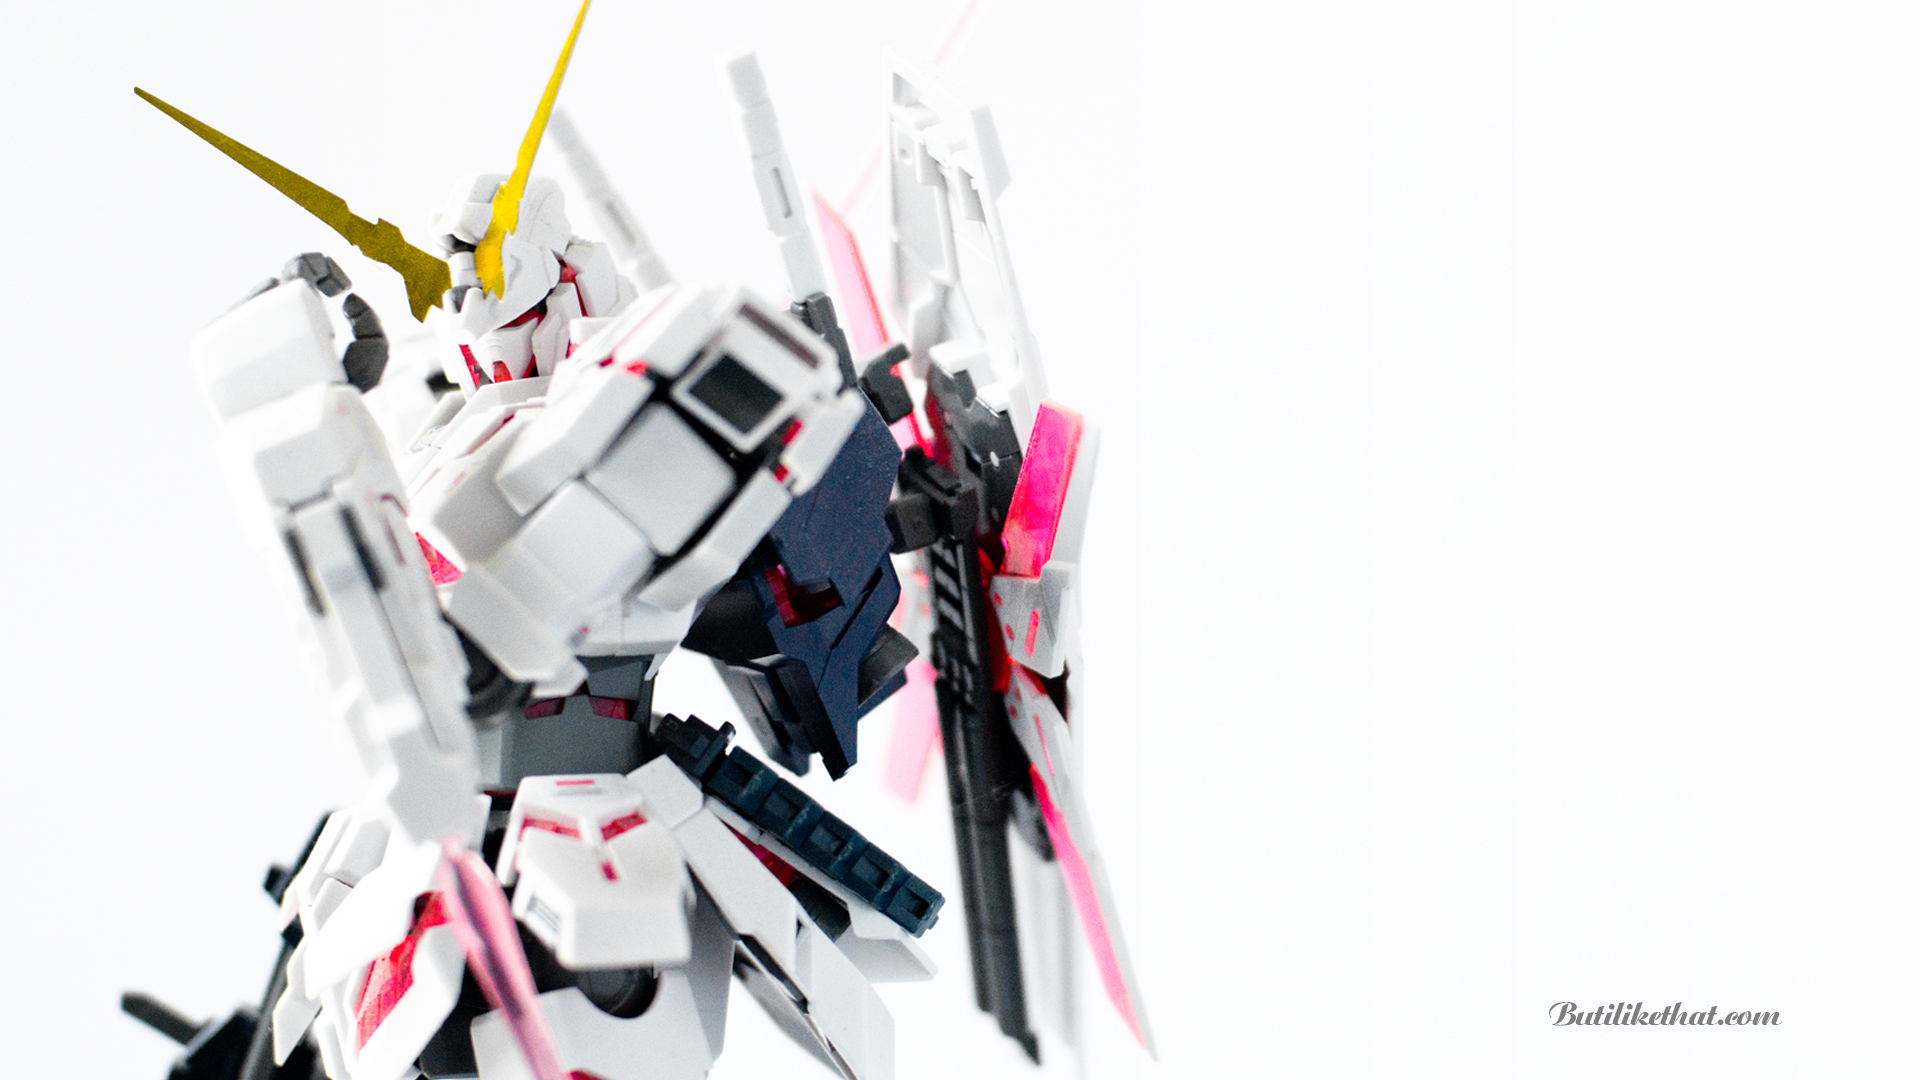 Hd Gundam Themes: [71+] Gundam Unicorn Wallpaper On WallpaperSafari